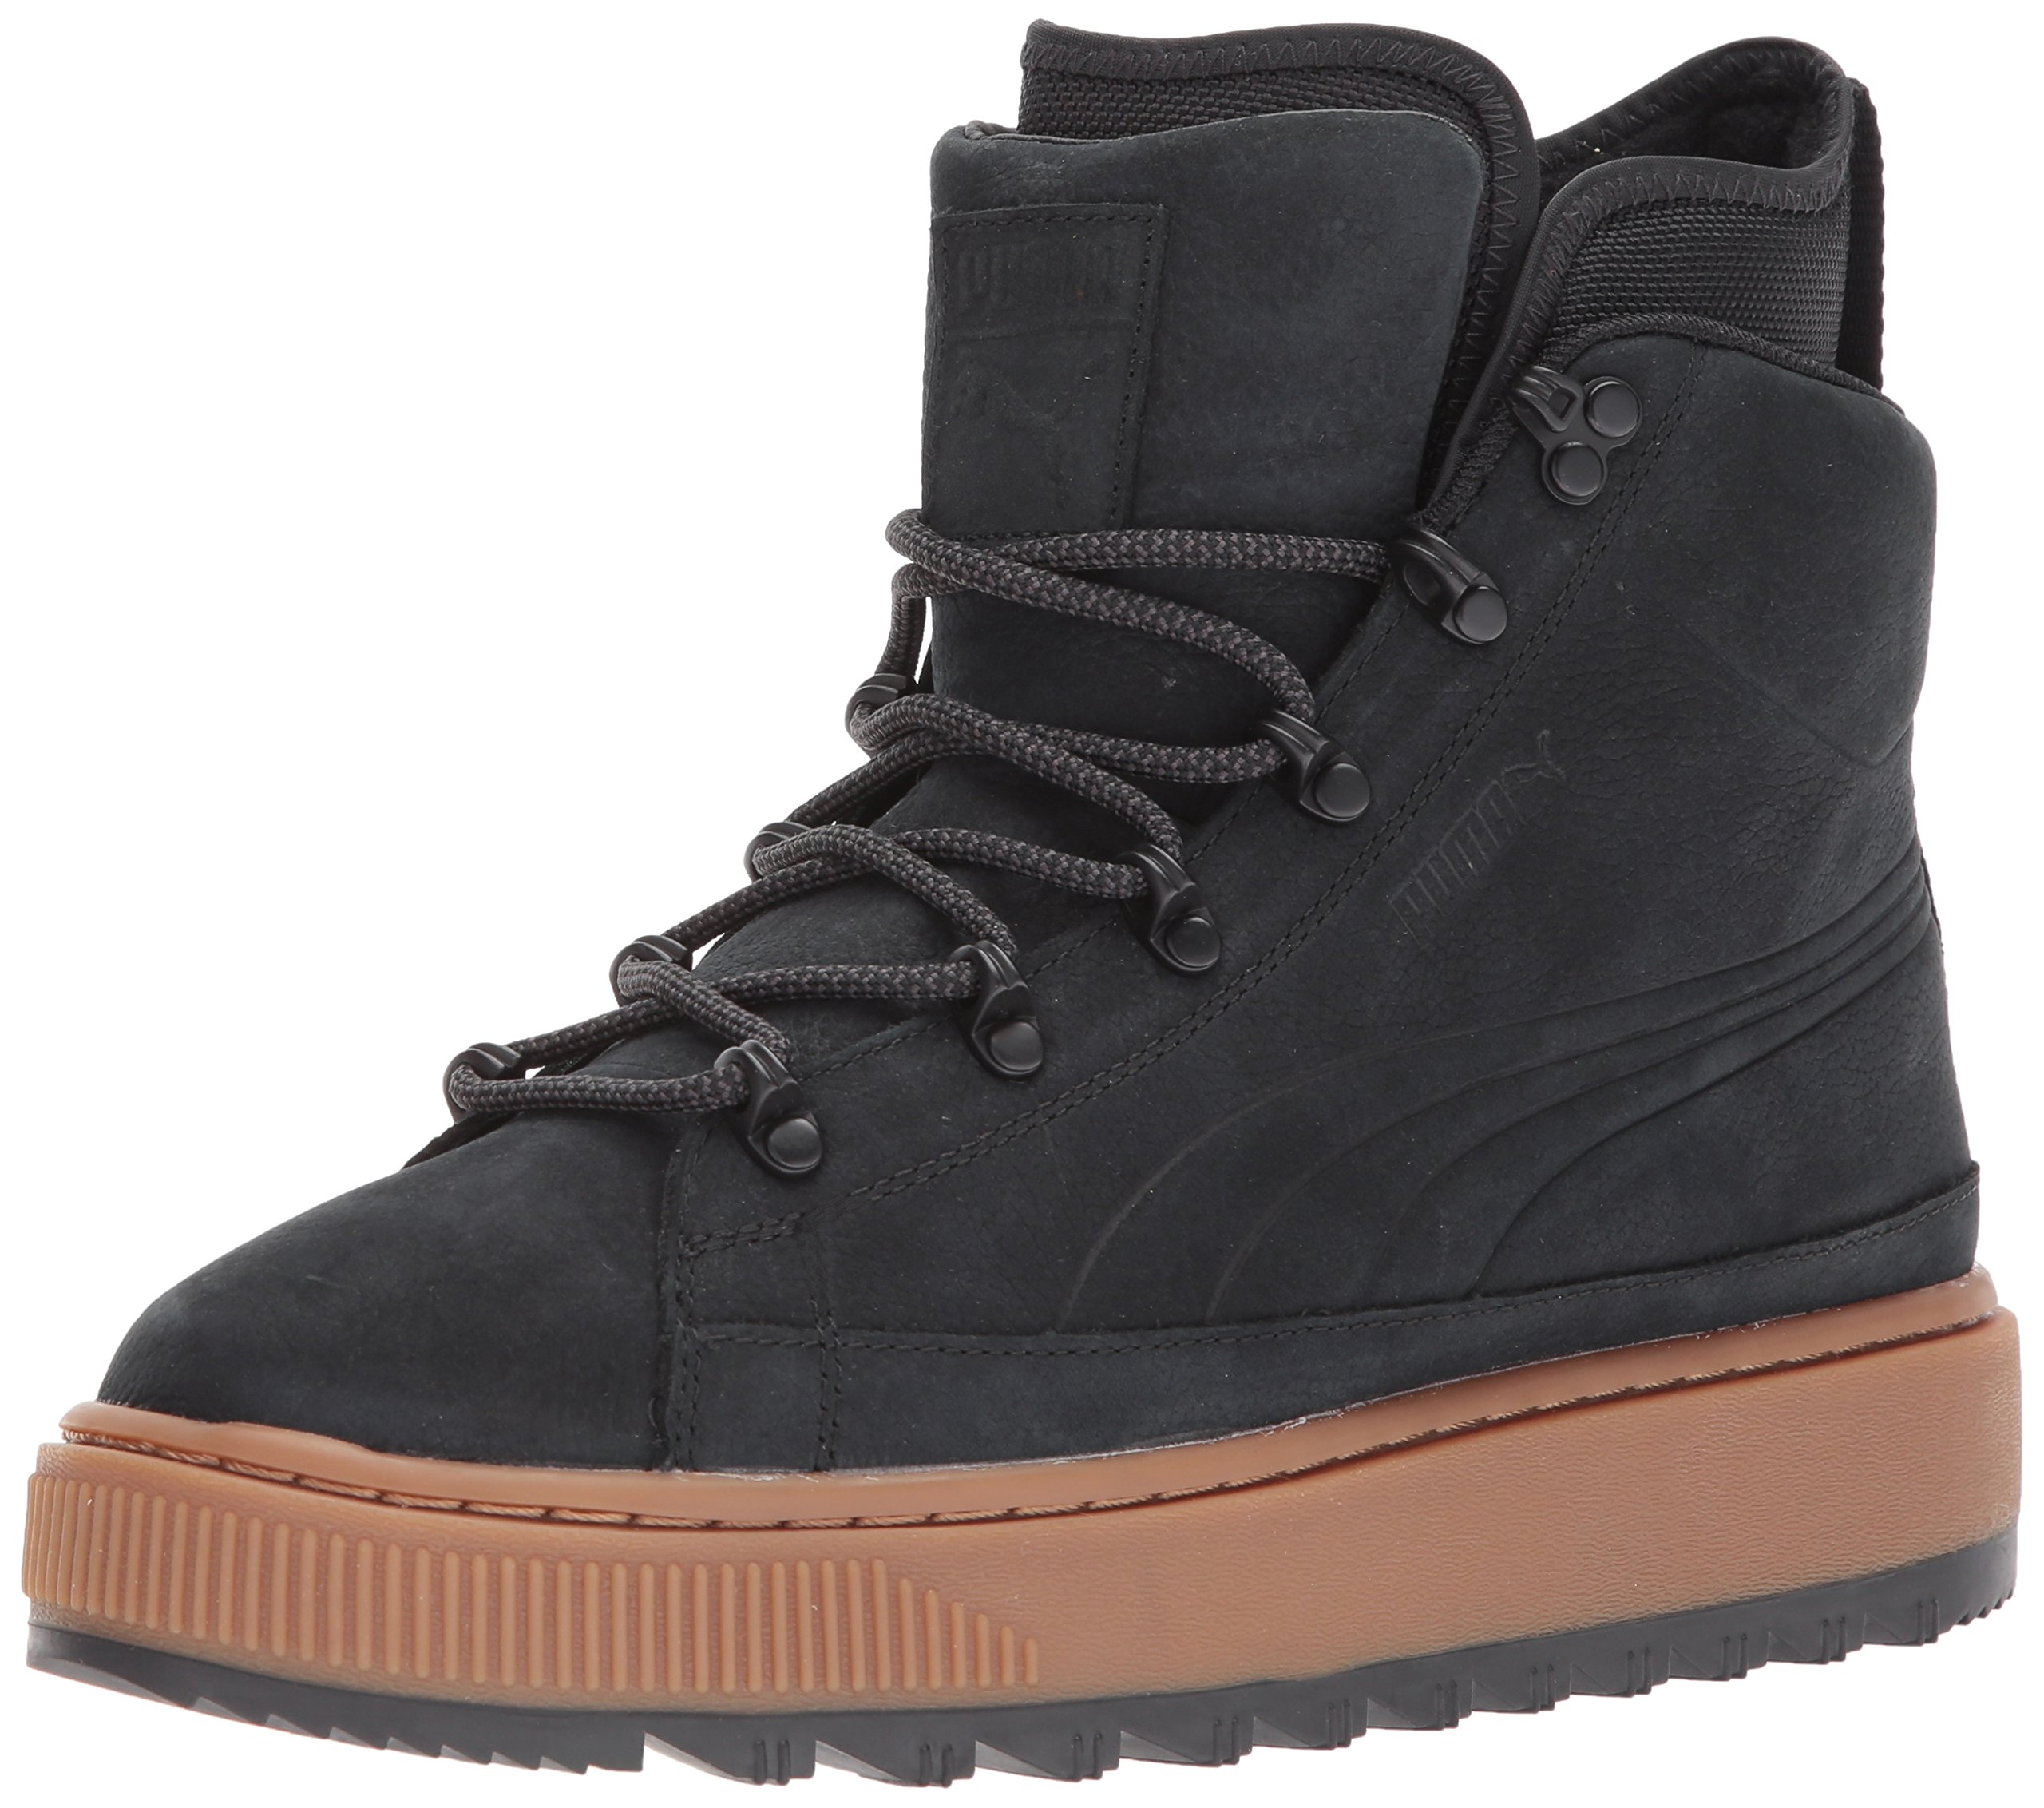 PUMA Men's the Ren Boot Nbk Sneaker, Puma Black, 9 M US